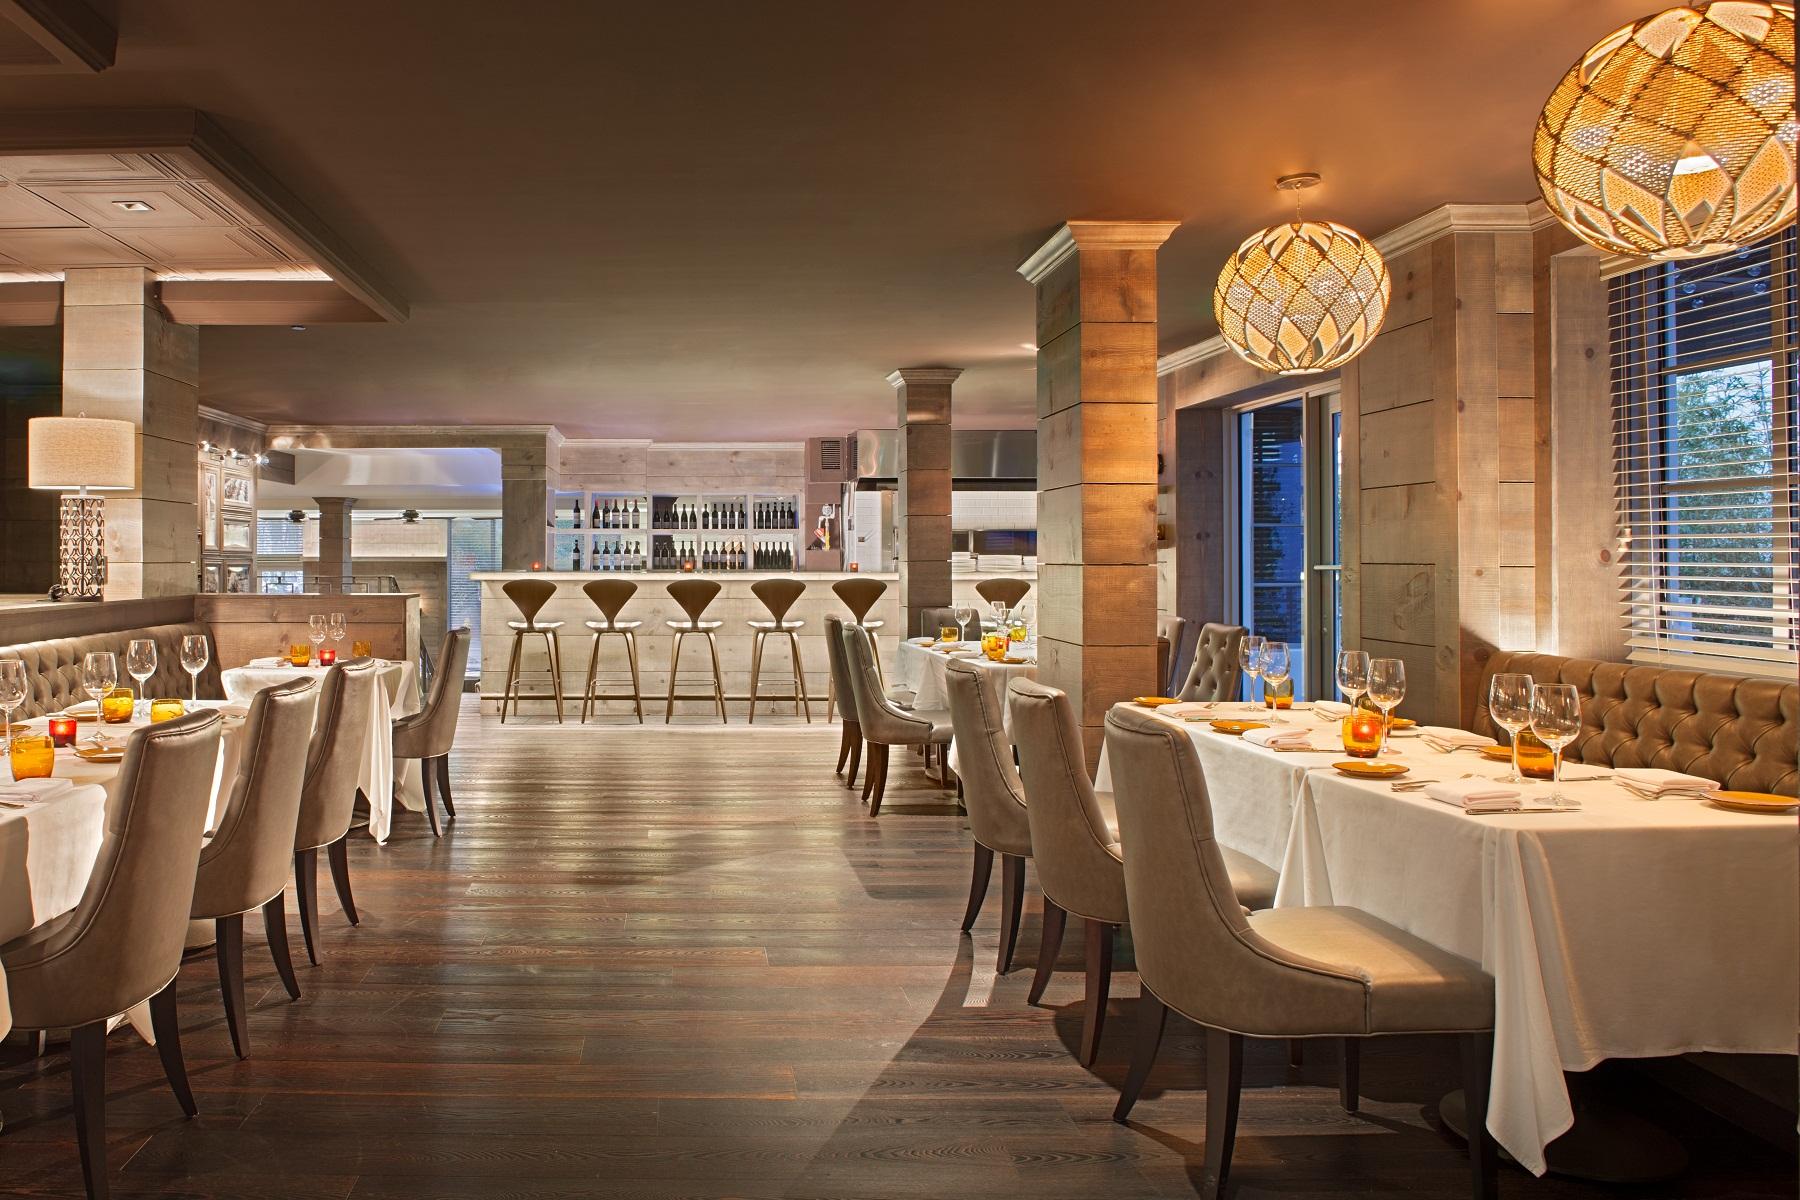 New York Based Ldv Hospitality S Dolce Italian Heading To The Frey Hotel Eater Chicago